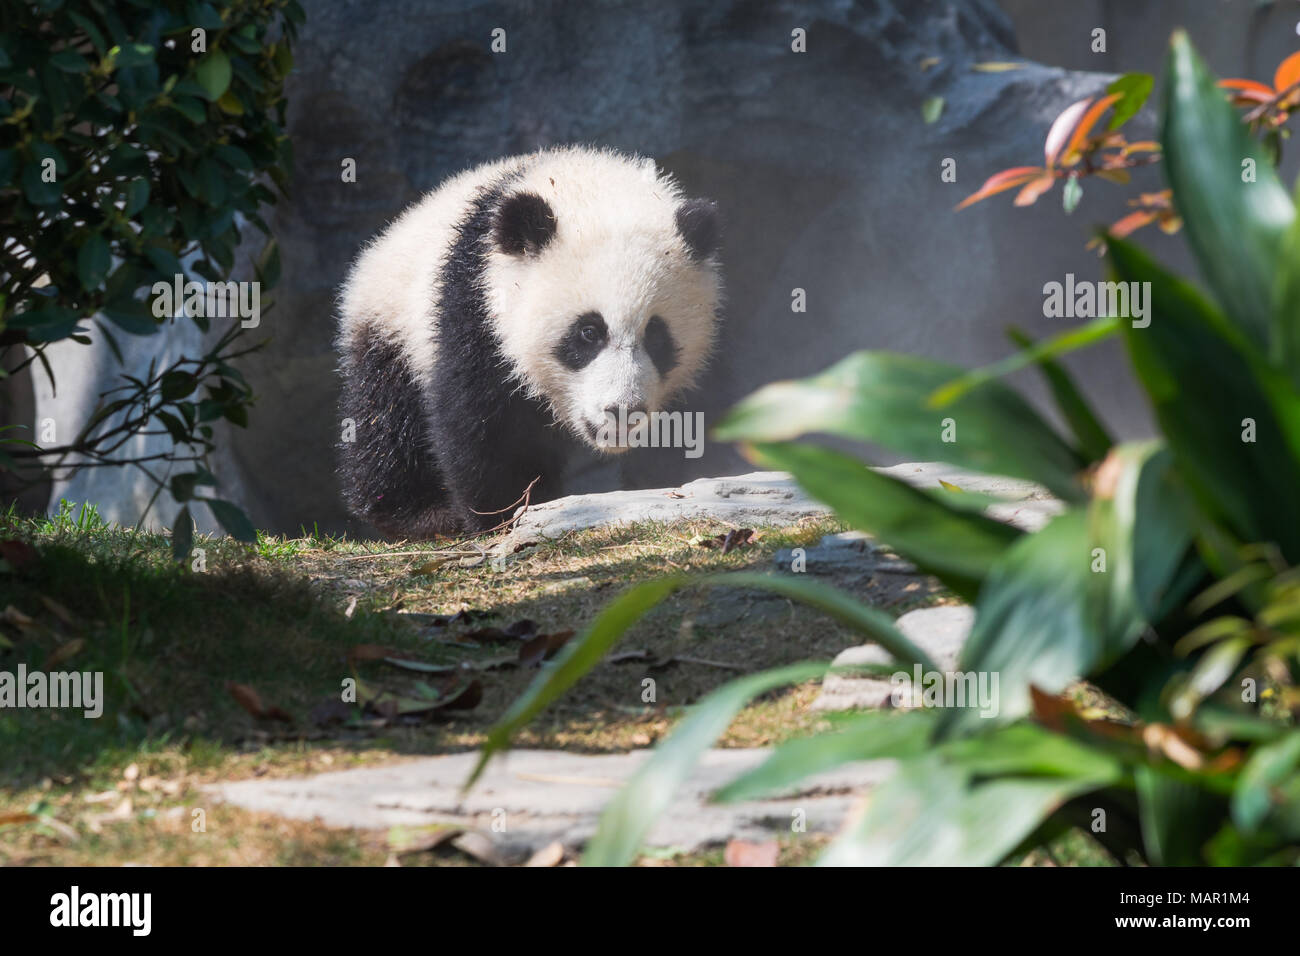 Panda cub walking in sunshine, Chengdu, China - Stock Image